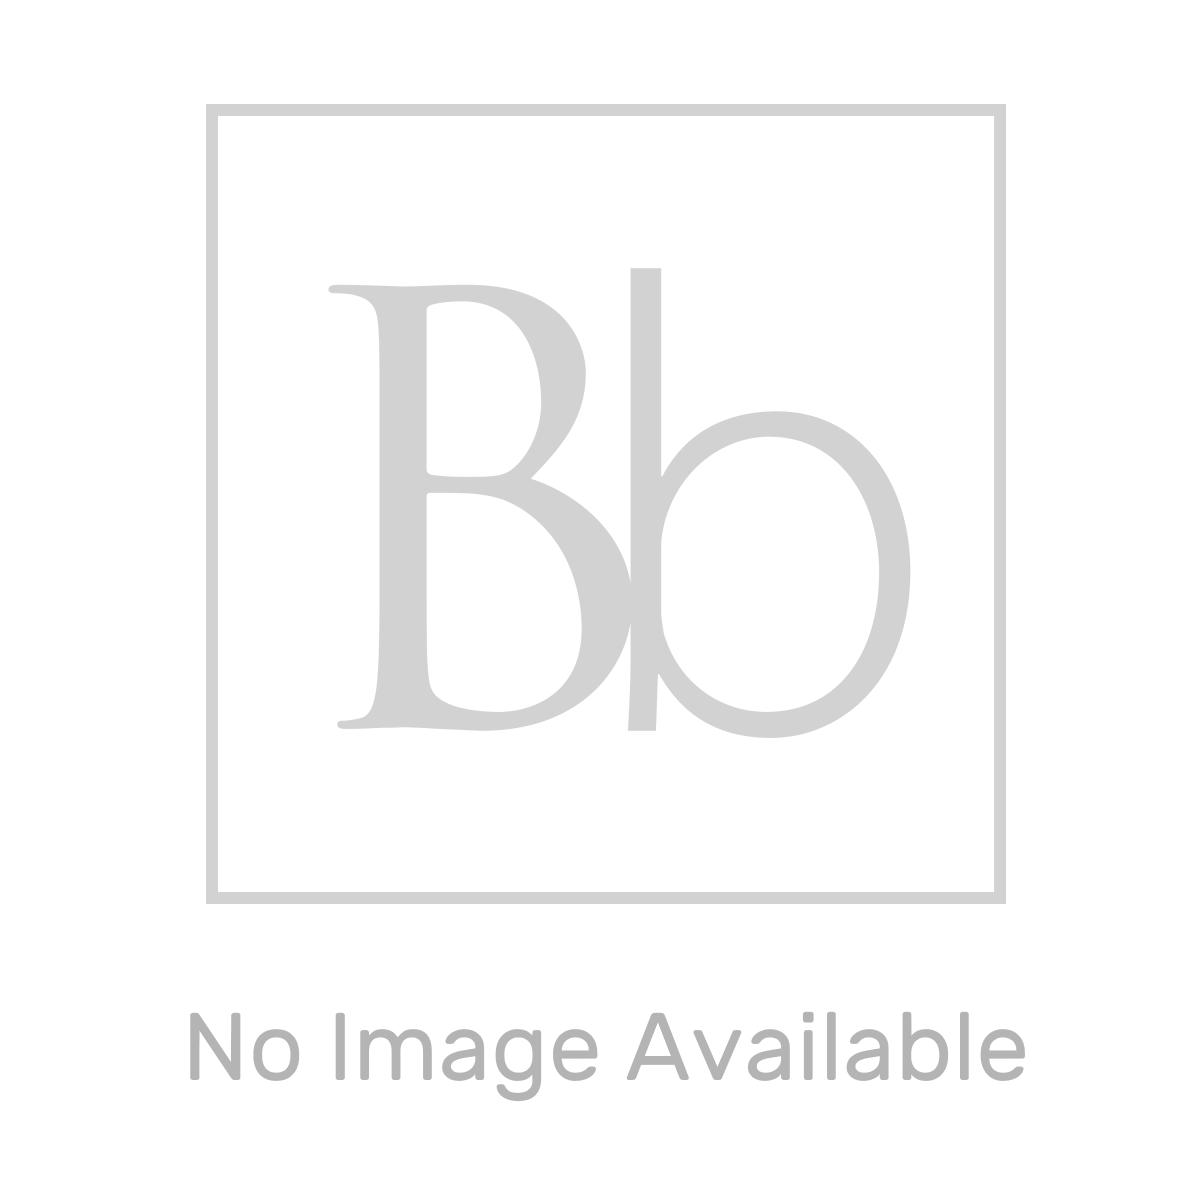 Premier Athena Gloss White 2 Drawer Wall Hung Vanity Unit 500mm wuth Mid Edge Basin